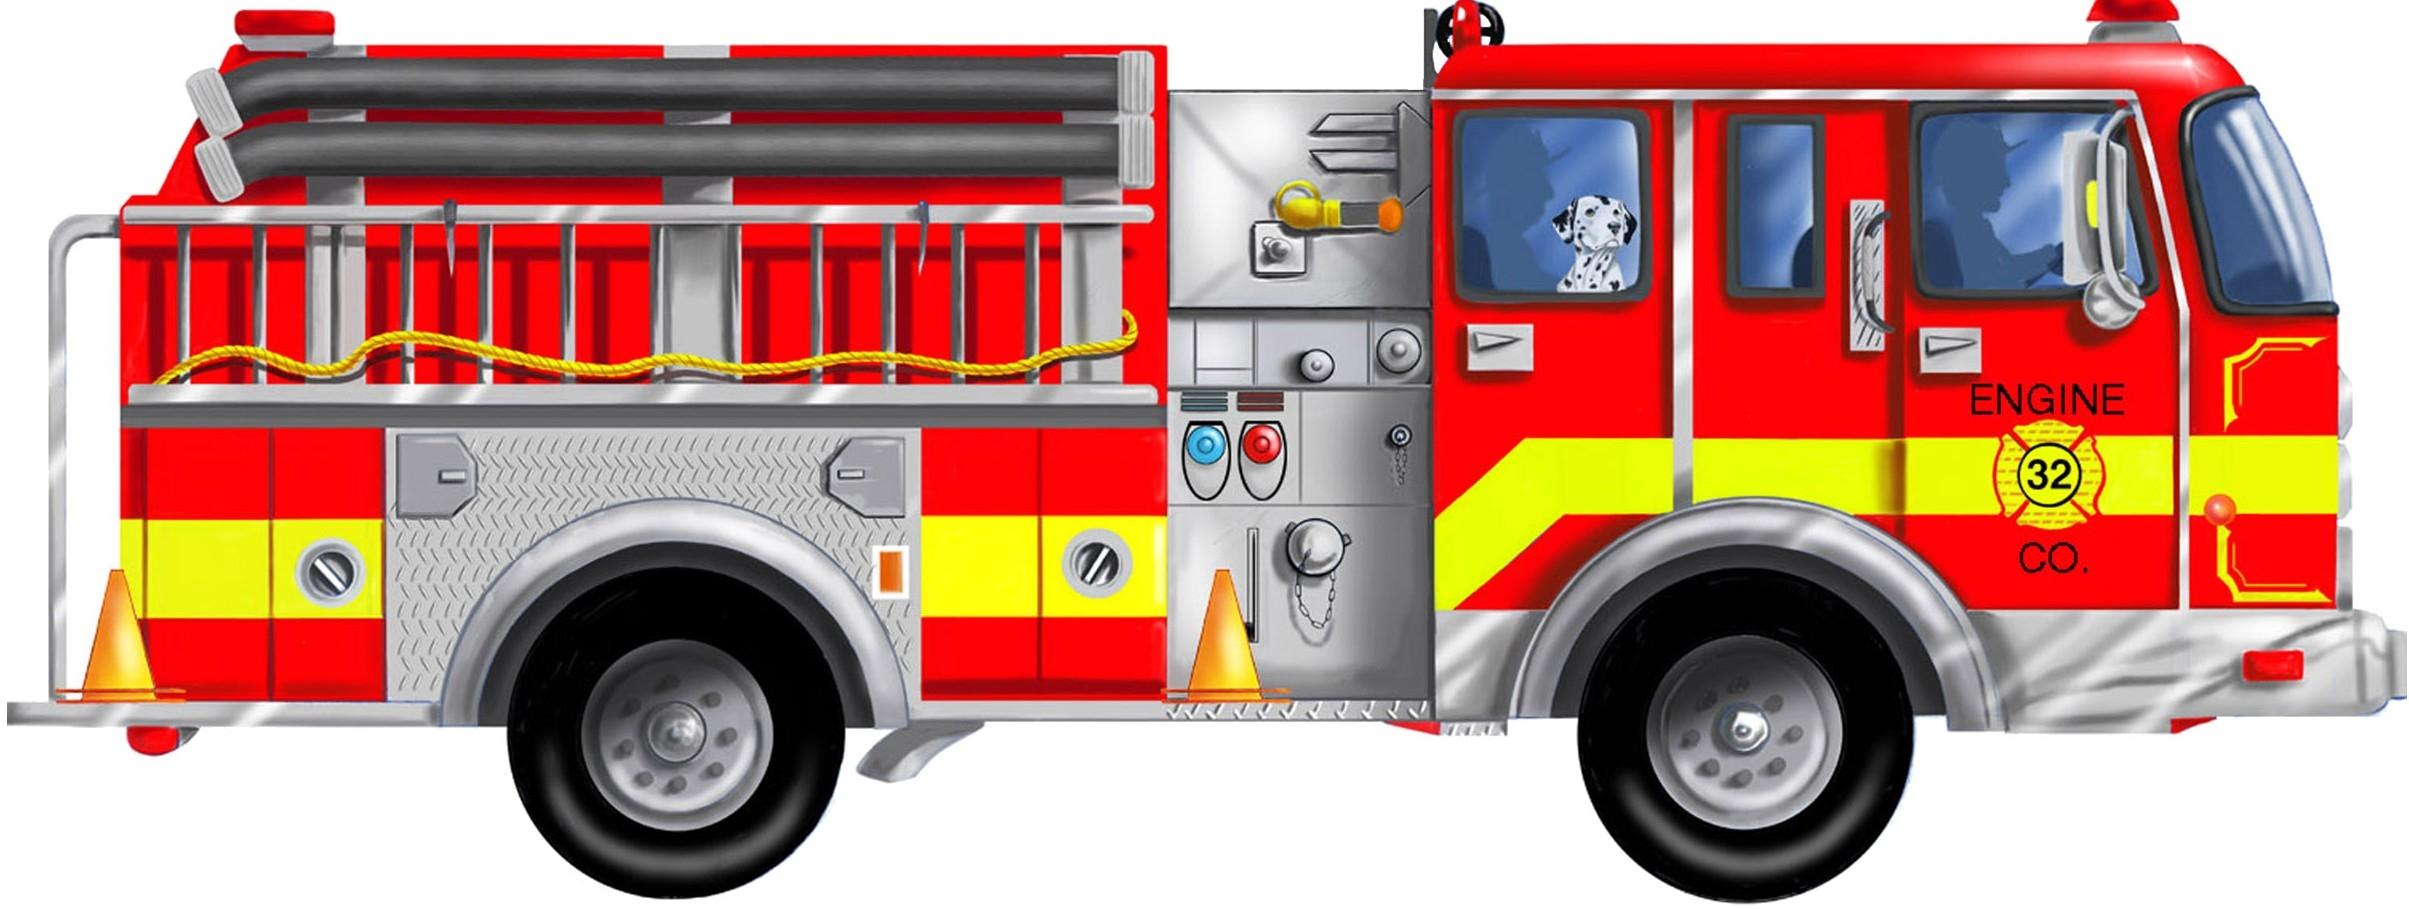 Fire truck truck parts clipart